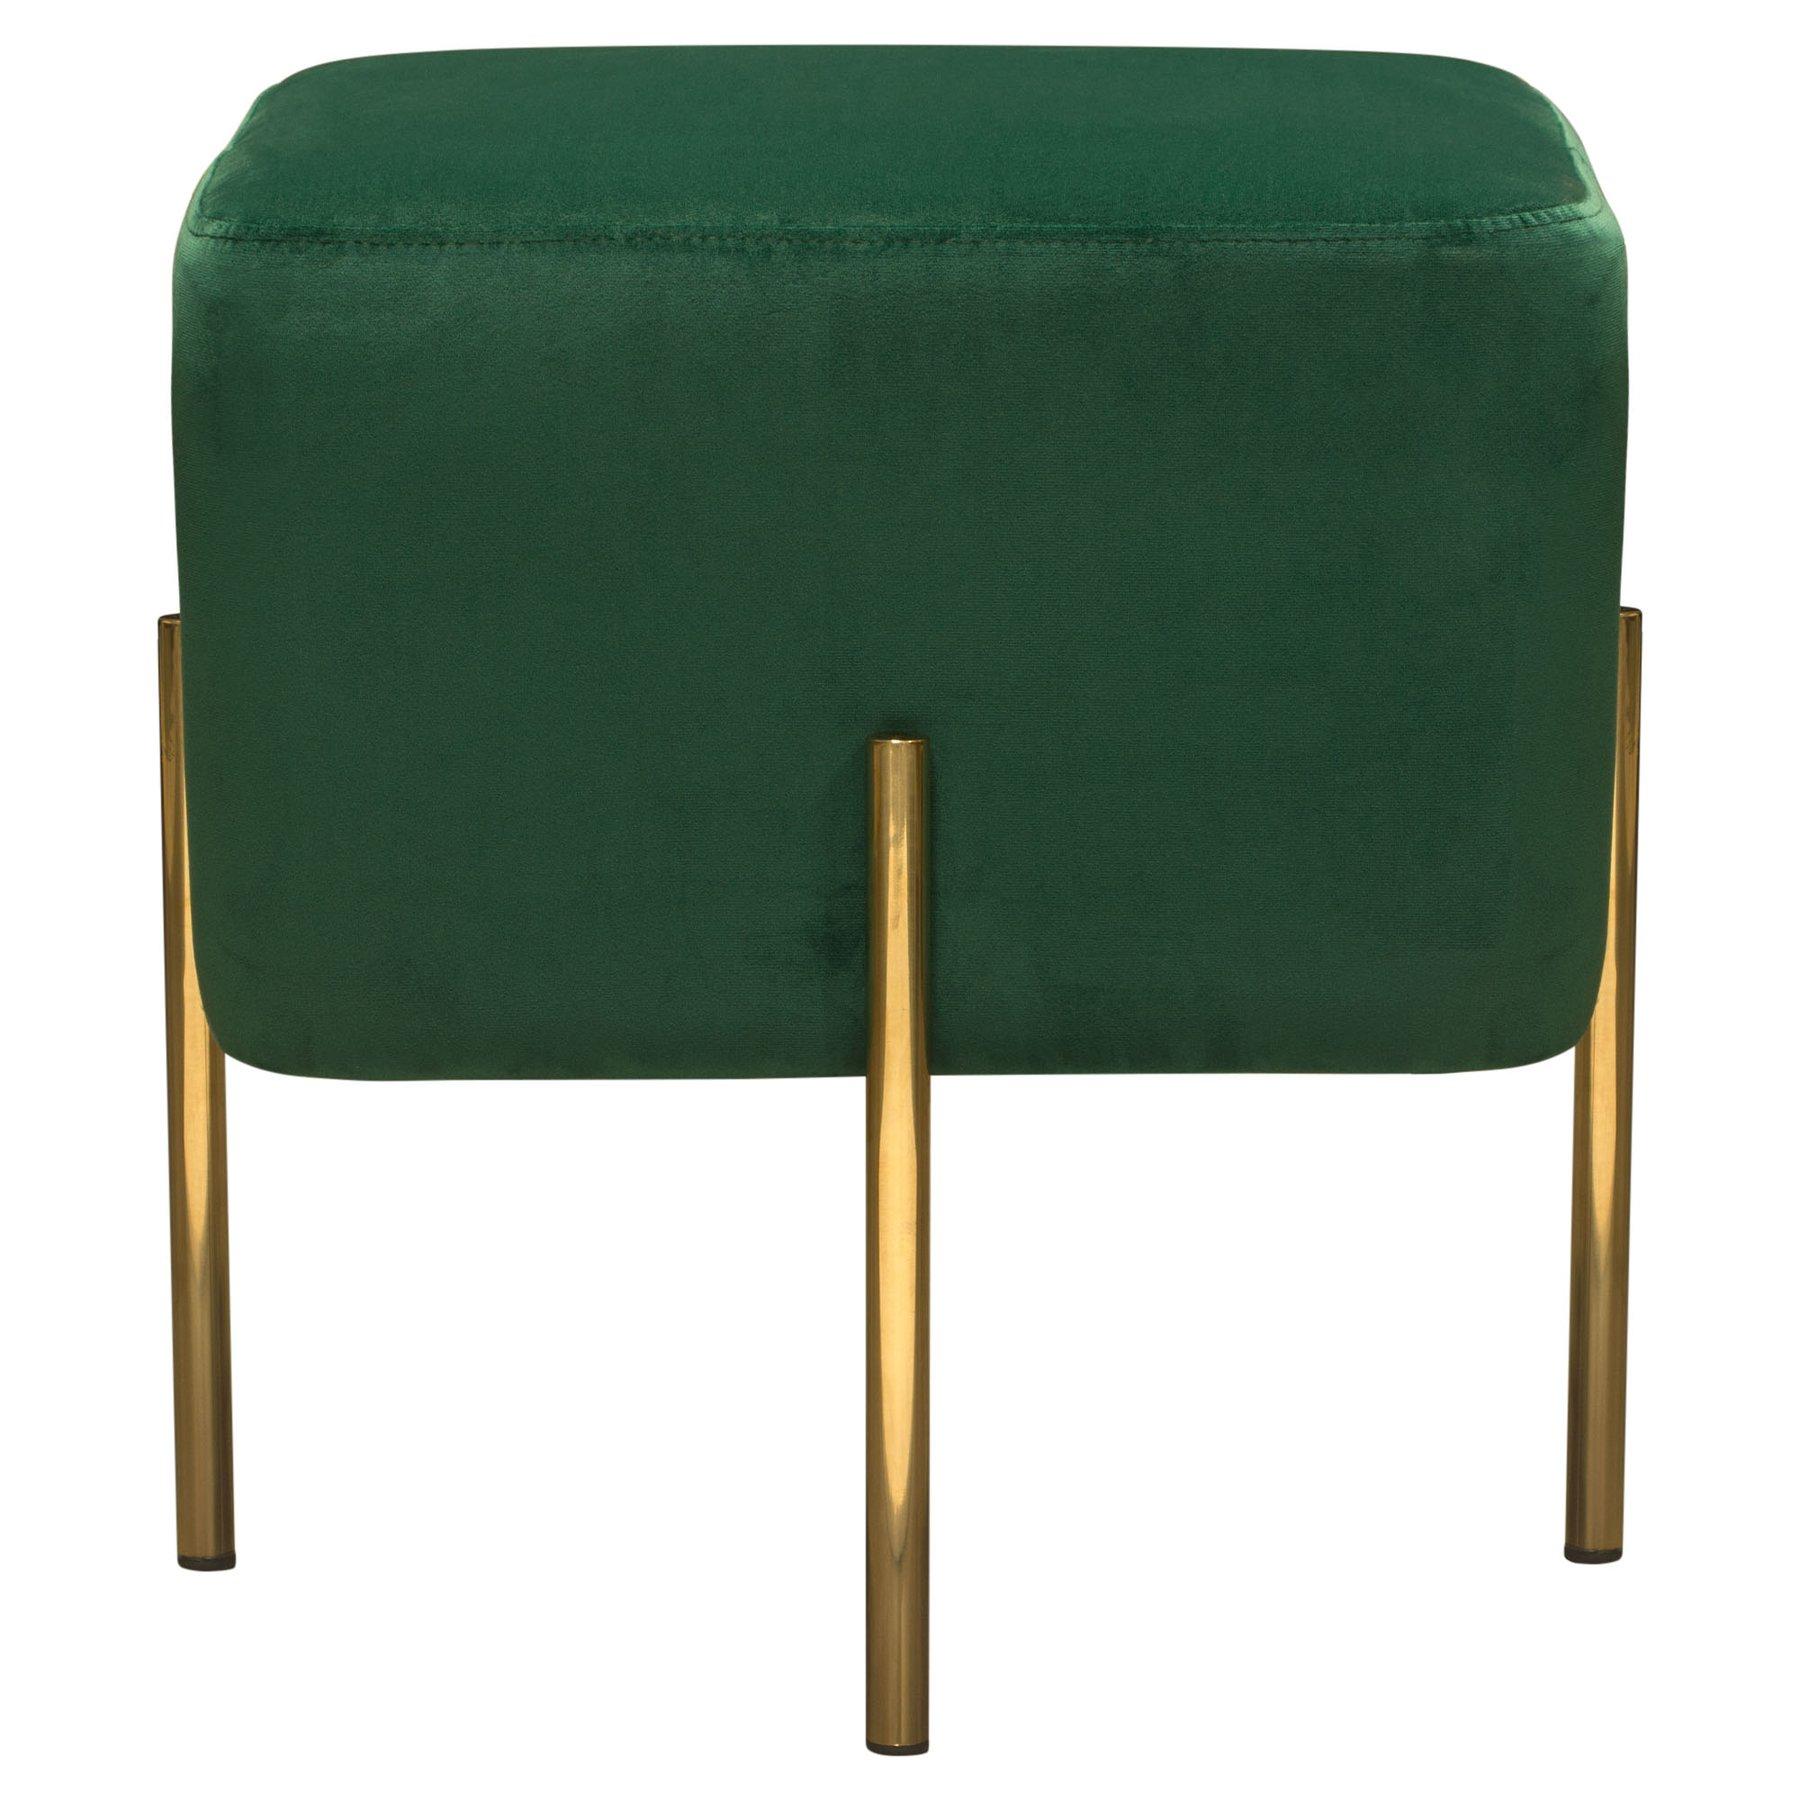 zoe square accent ott emerald green velvet gold metal zoeotem signy drum table tap pinch zoom sofa design wooden threshold bar mid century kitchen halloween quilted runner